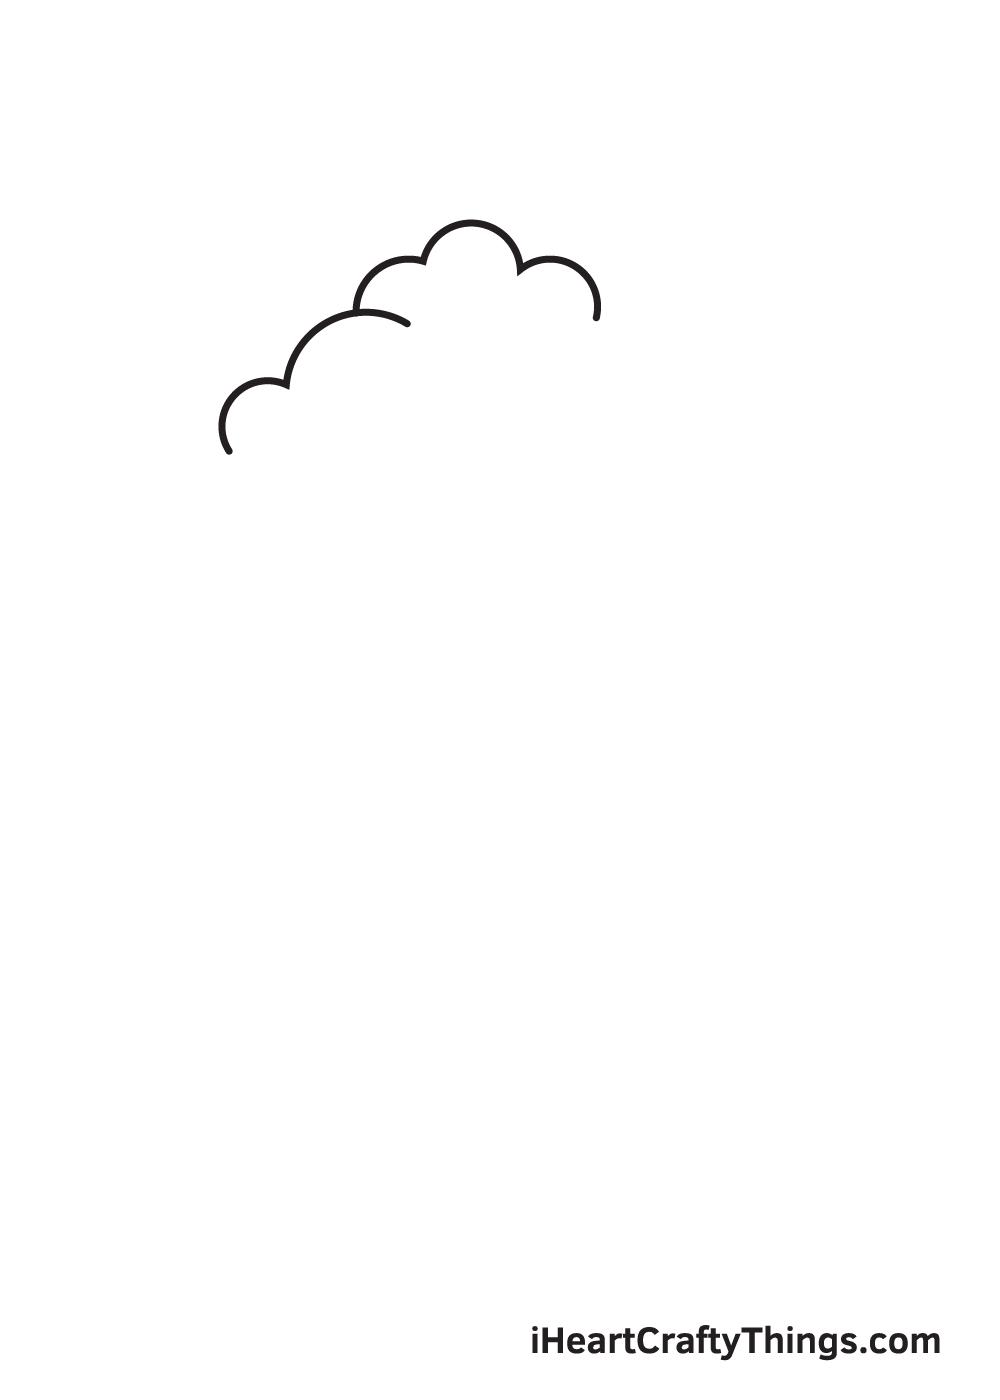 tree drawing step 2